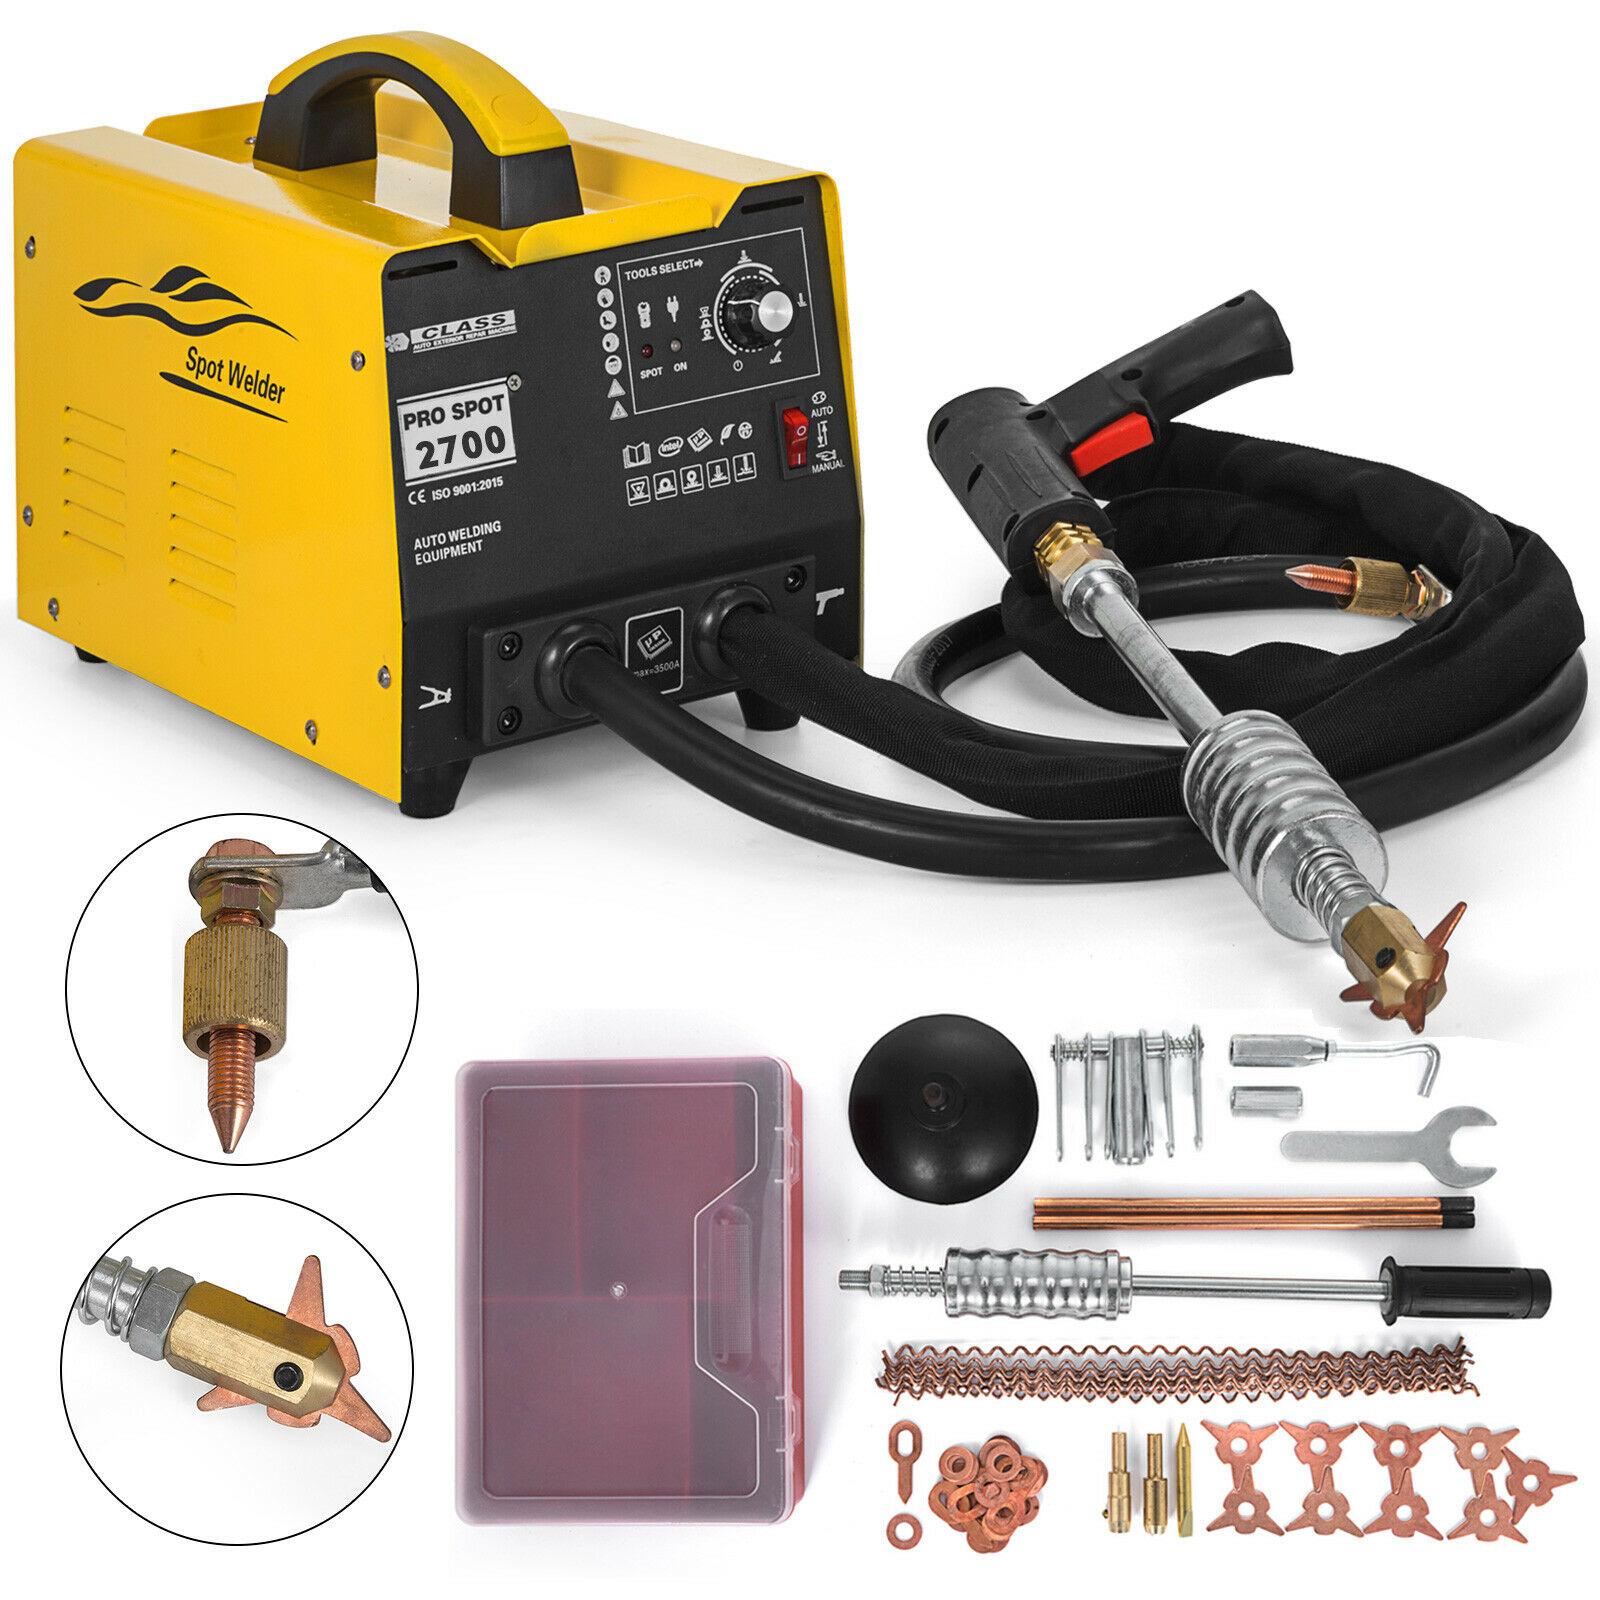 110V/220V GYSSpot 3500A Bodywork Dent Remover, 220 V Car Dent Puller, 2-Gun Dent Removal Tool, Professional Body Dent Removal